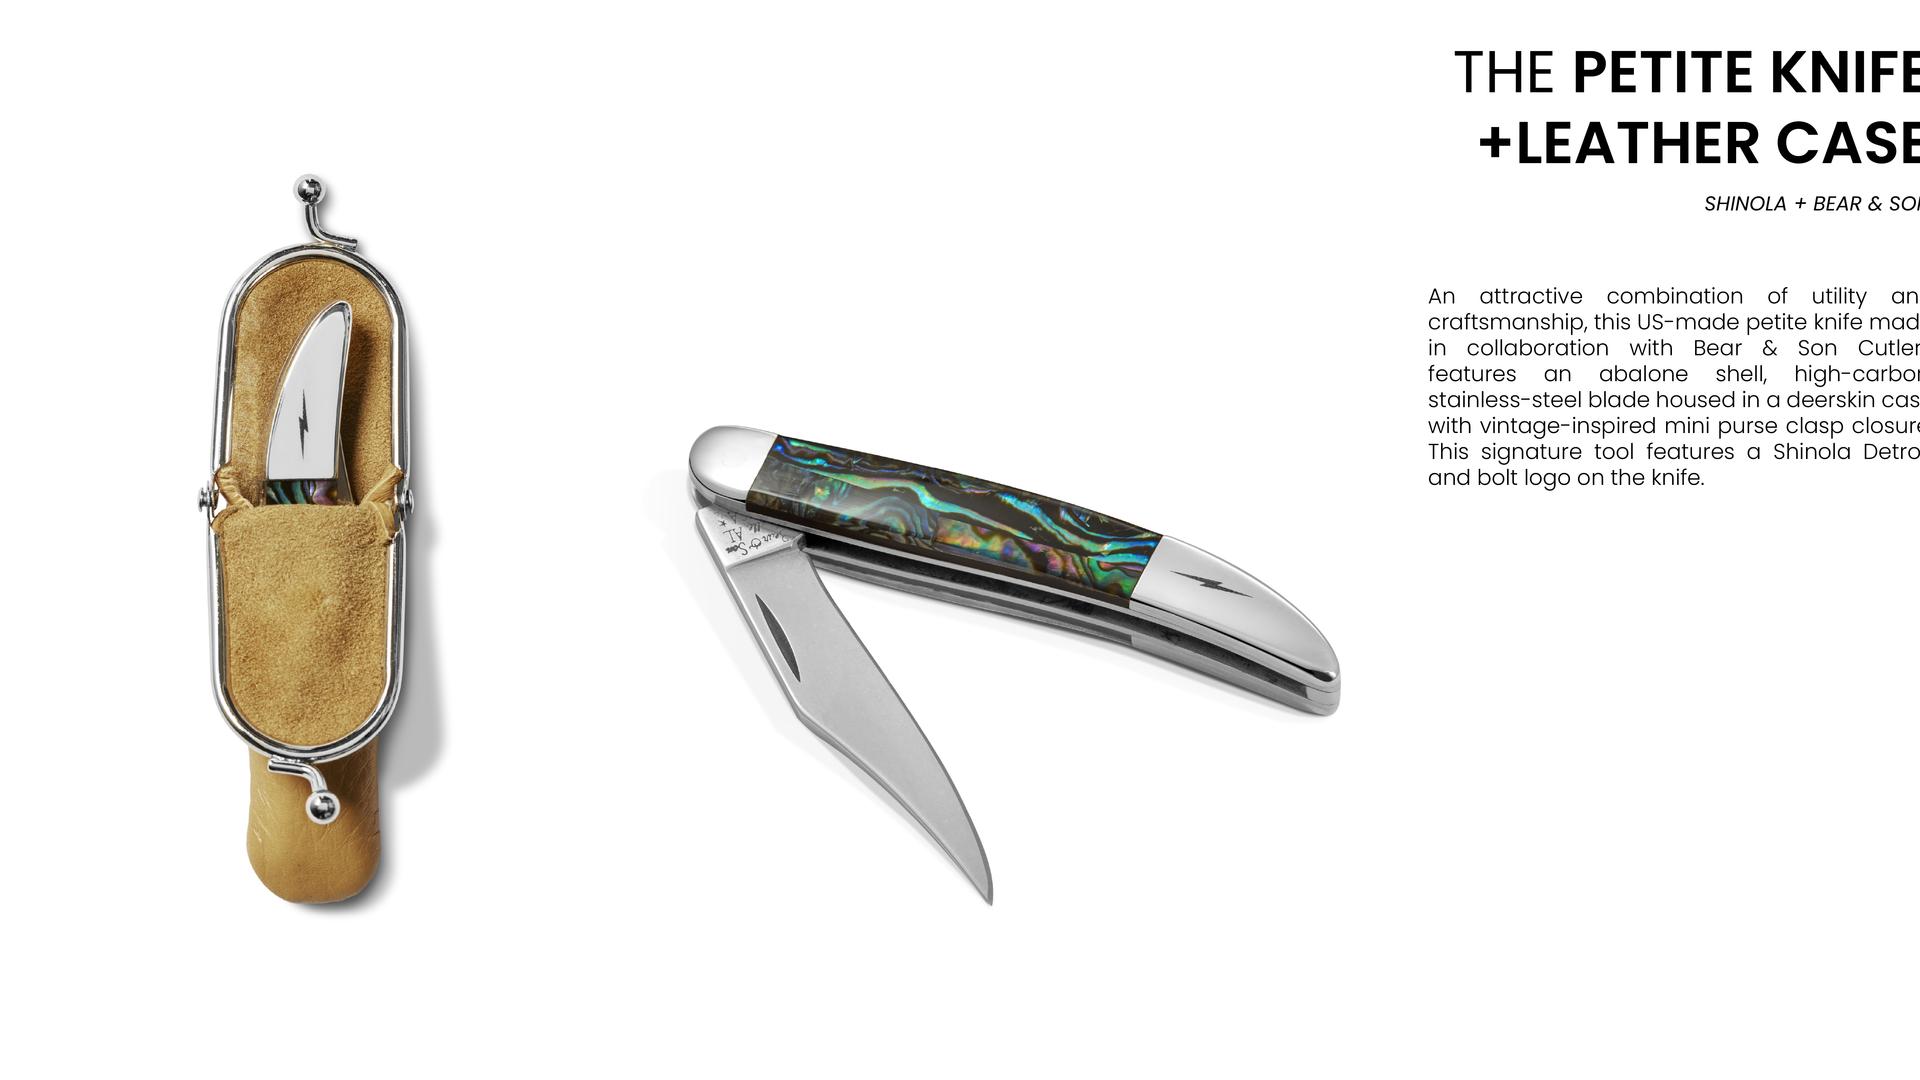 PETITE KNIFE-01.png